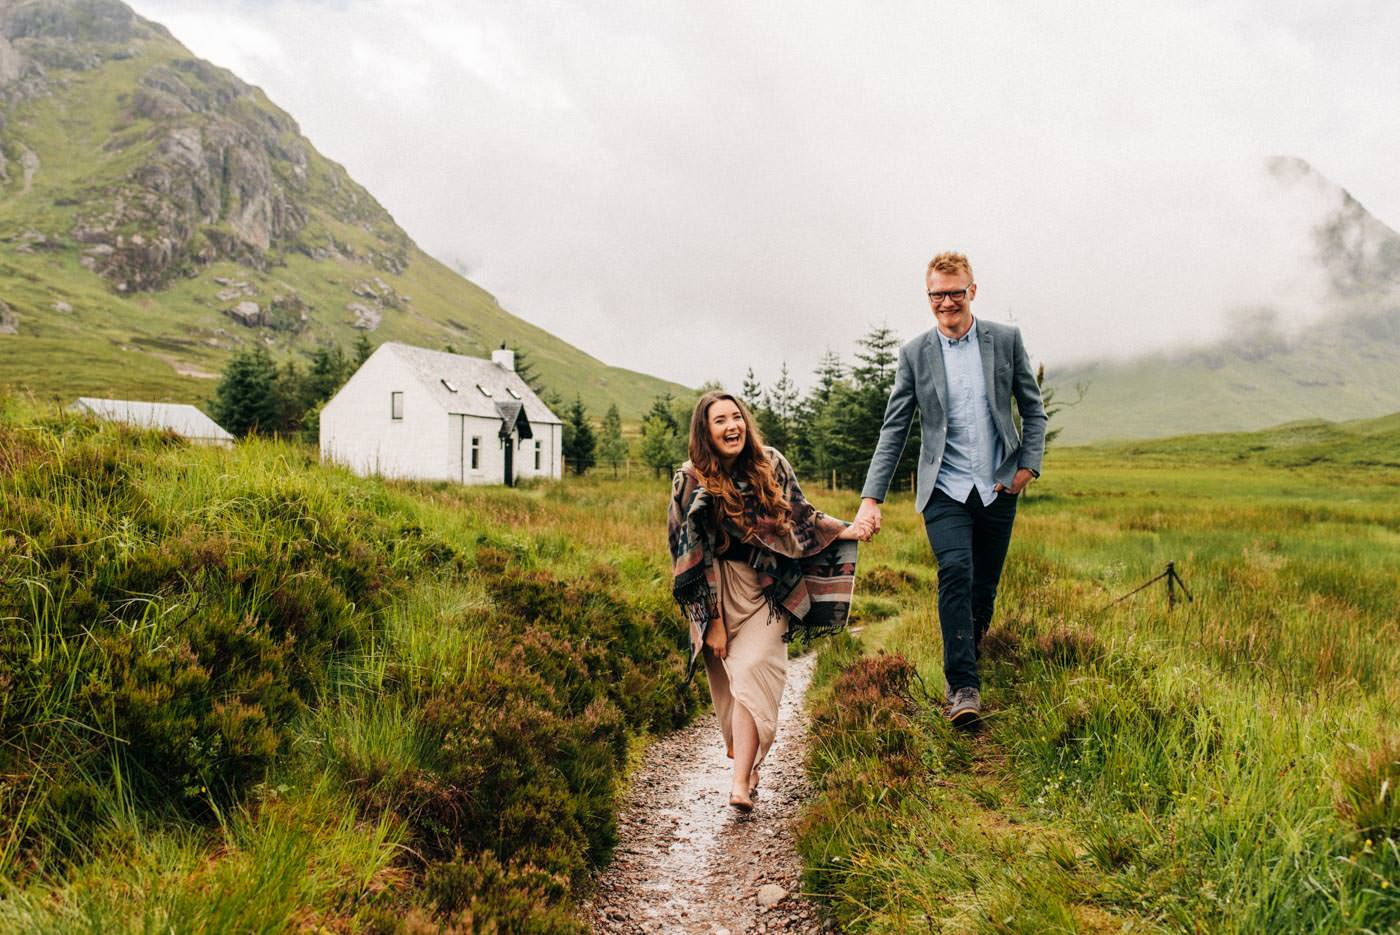 Isle of Skye Glencoe Elopement bride and groom